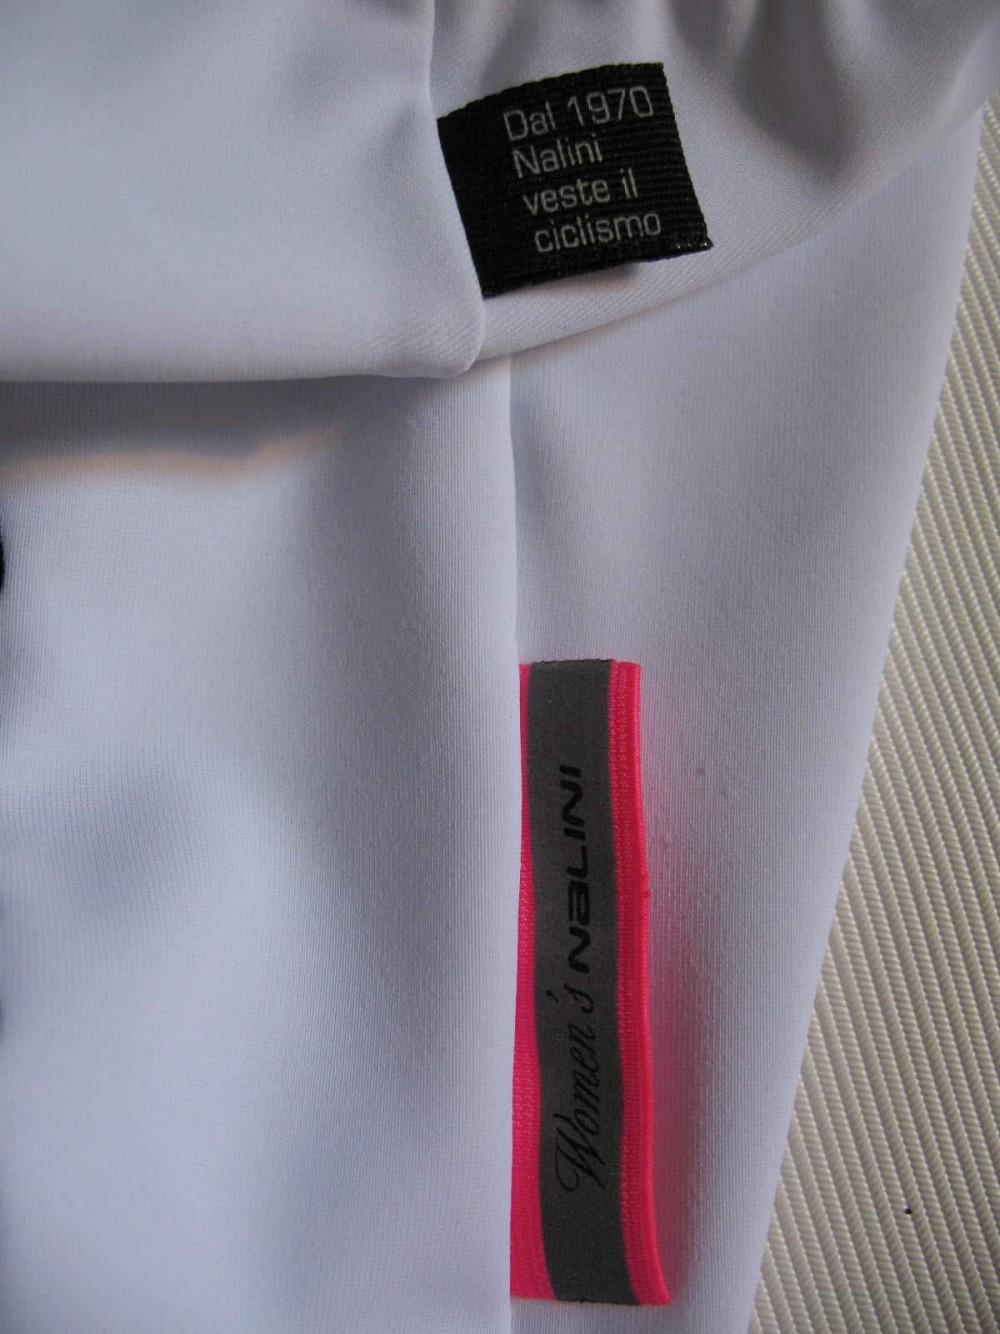 Велошорты NALINI white cycling shorts lady (размер S) - 5